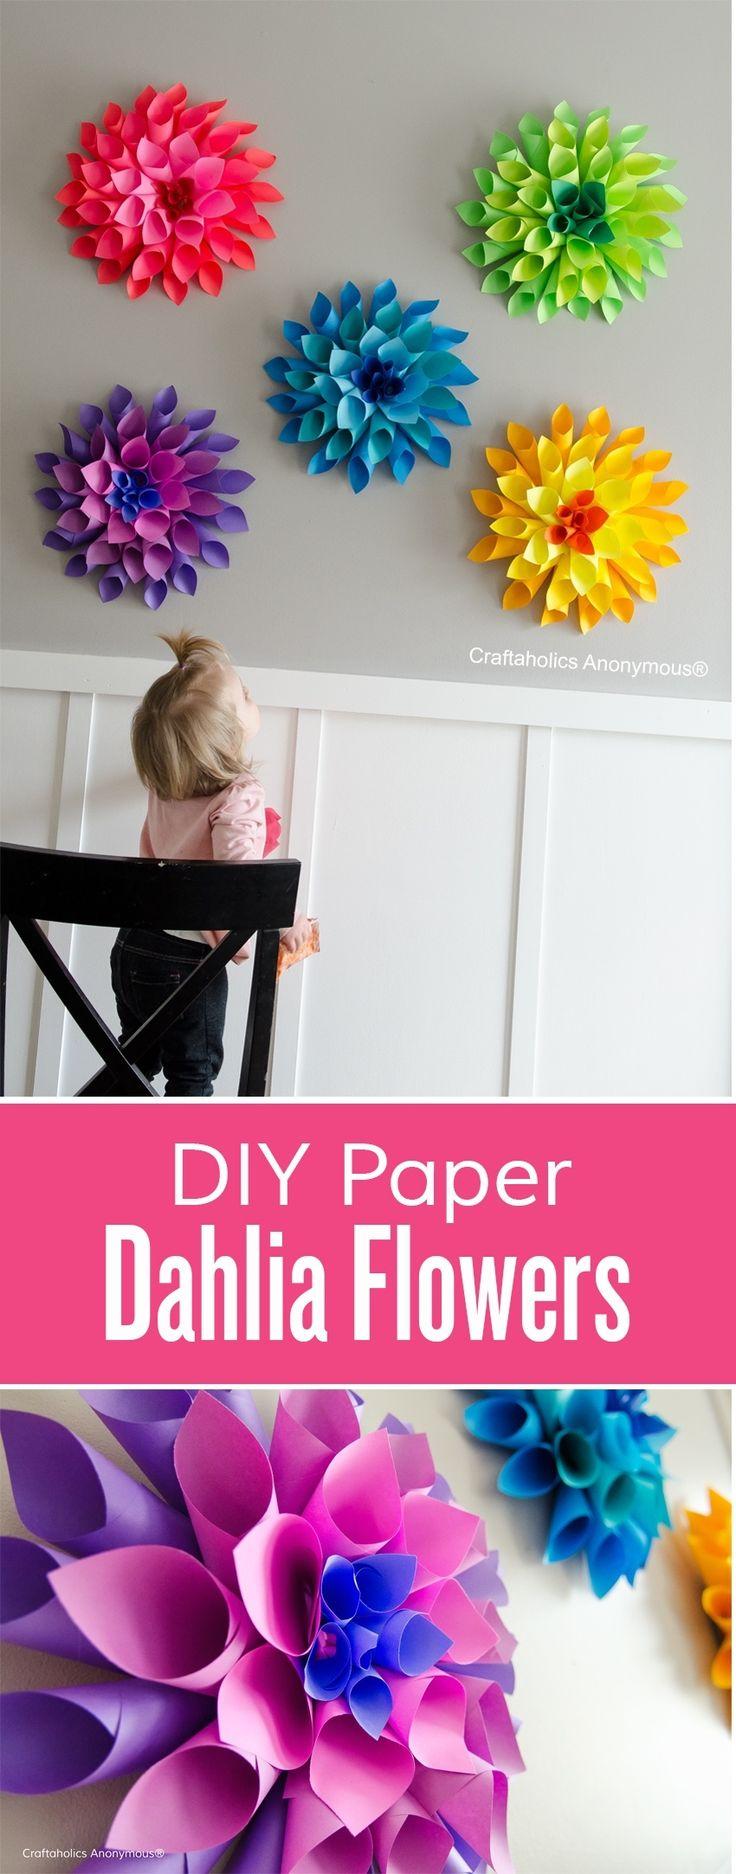 DIY Paper Dahlia Fowers Collage | 19 Simple DIY Wall Decor Ideas